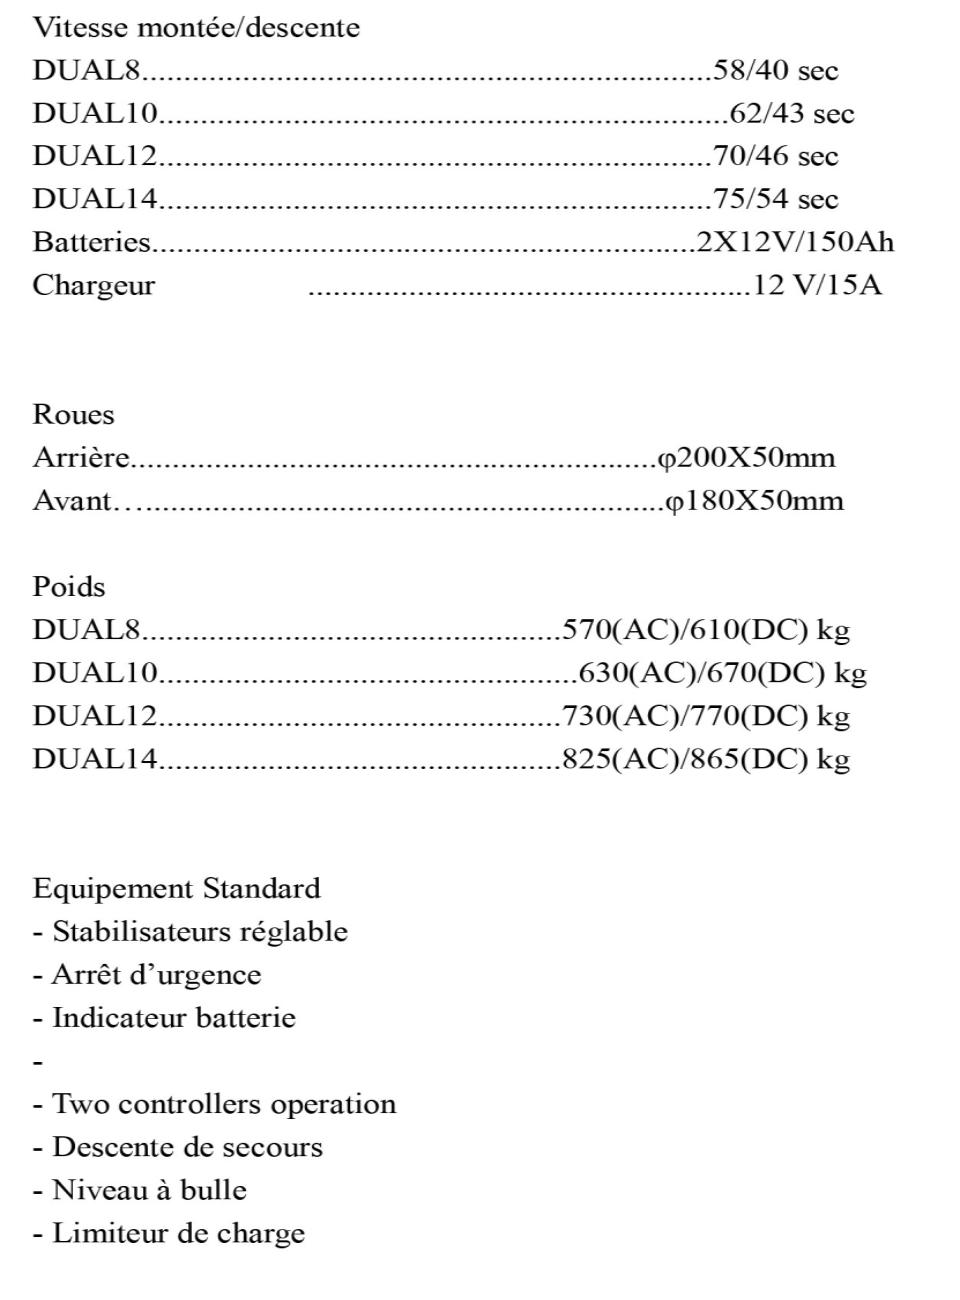 Plateform Dual